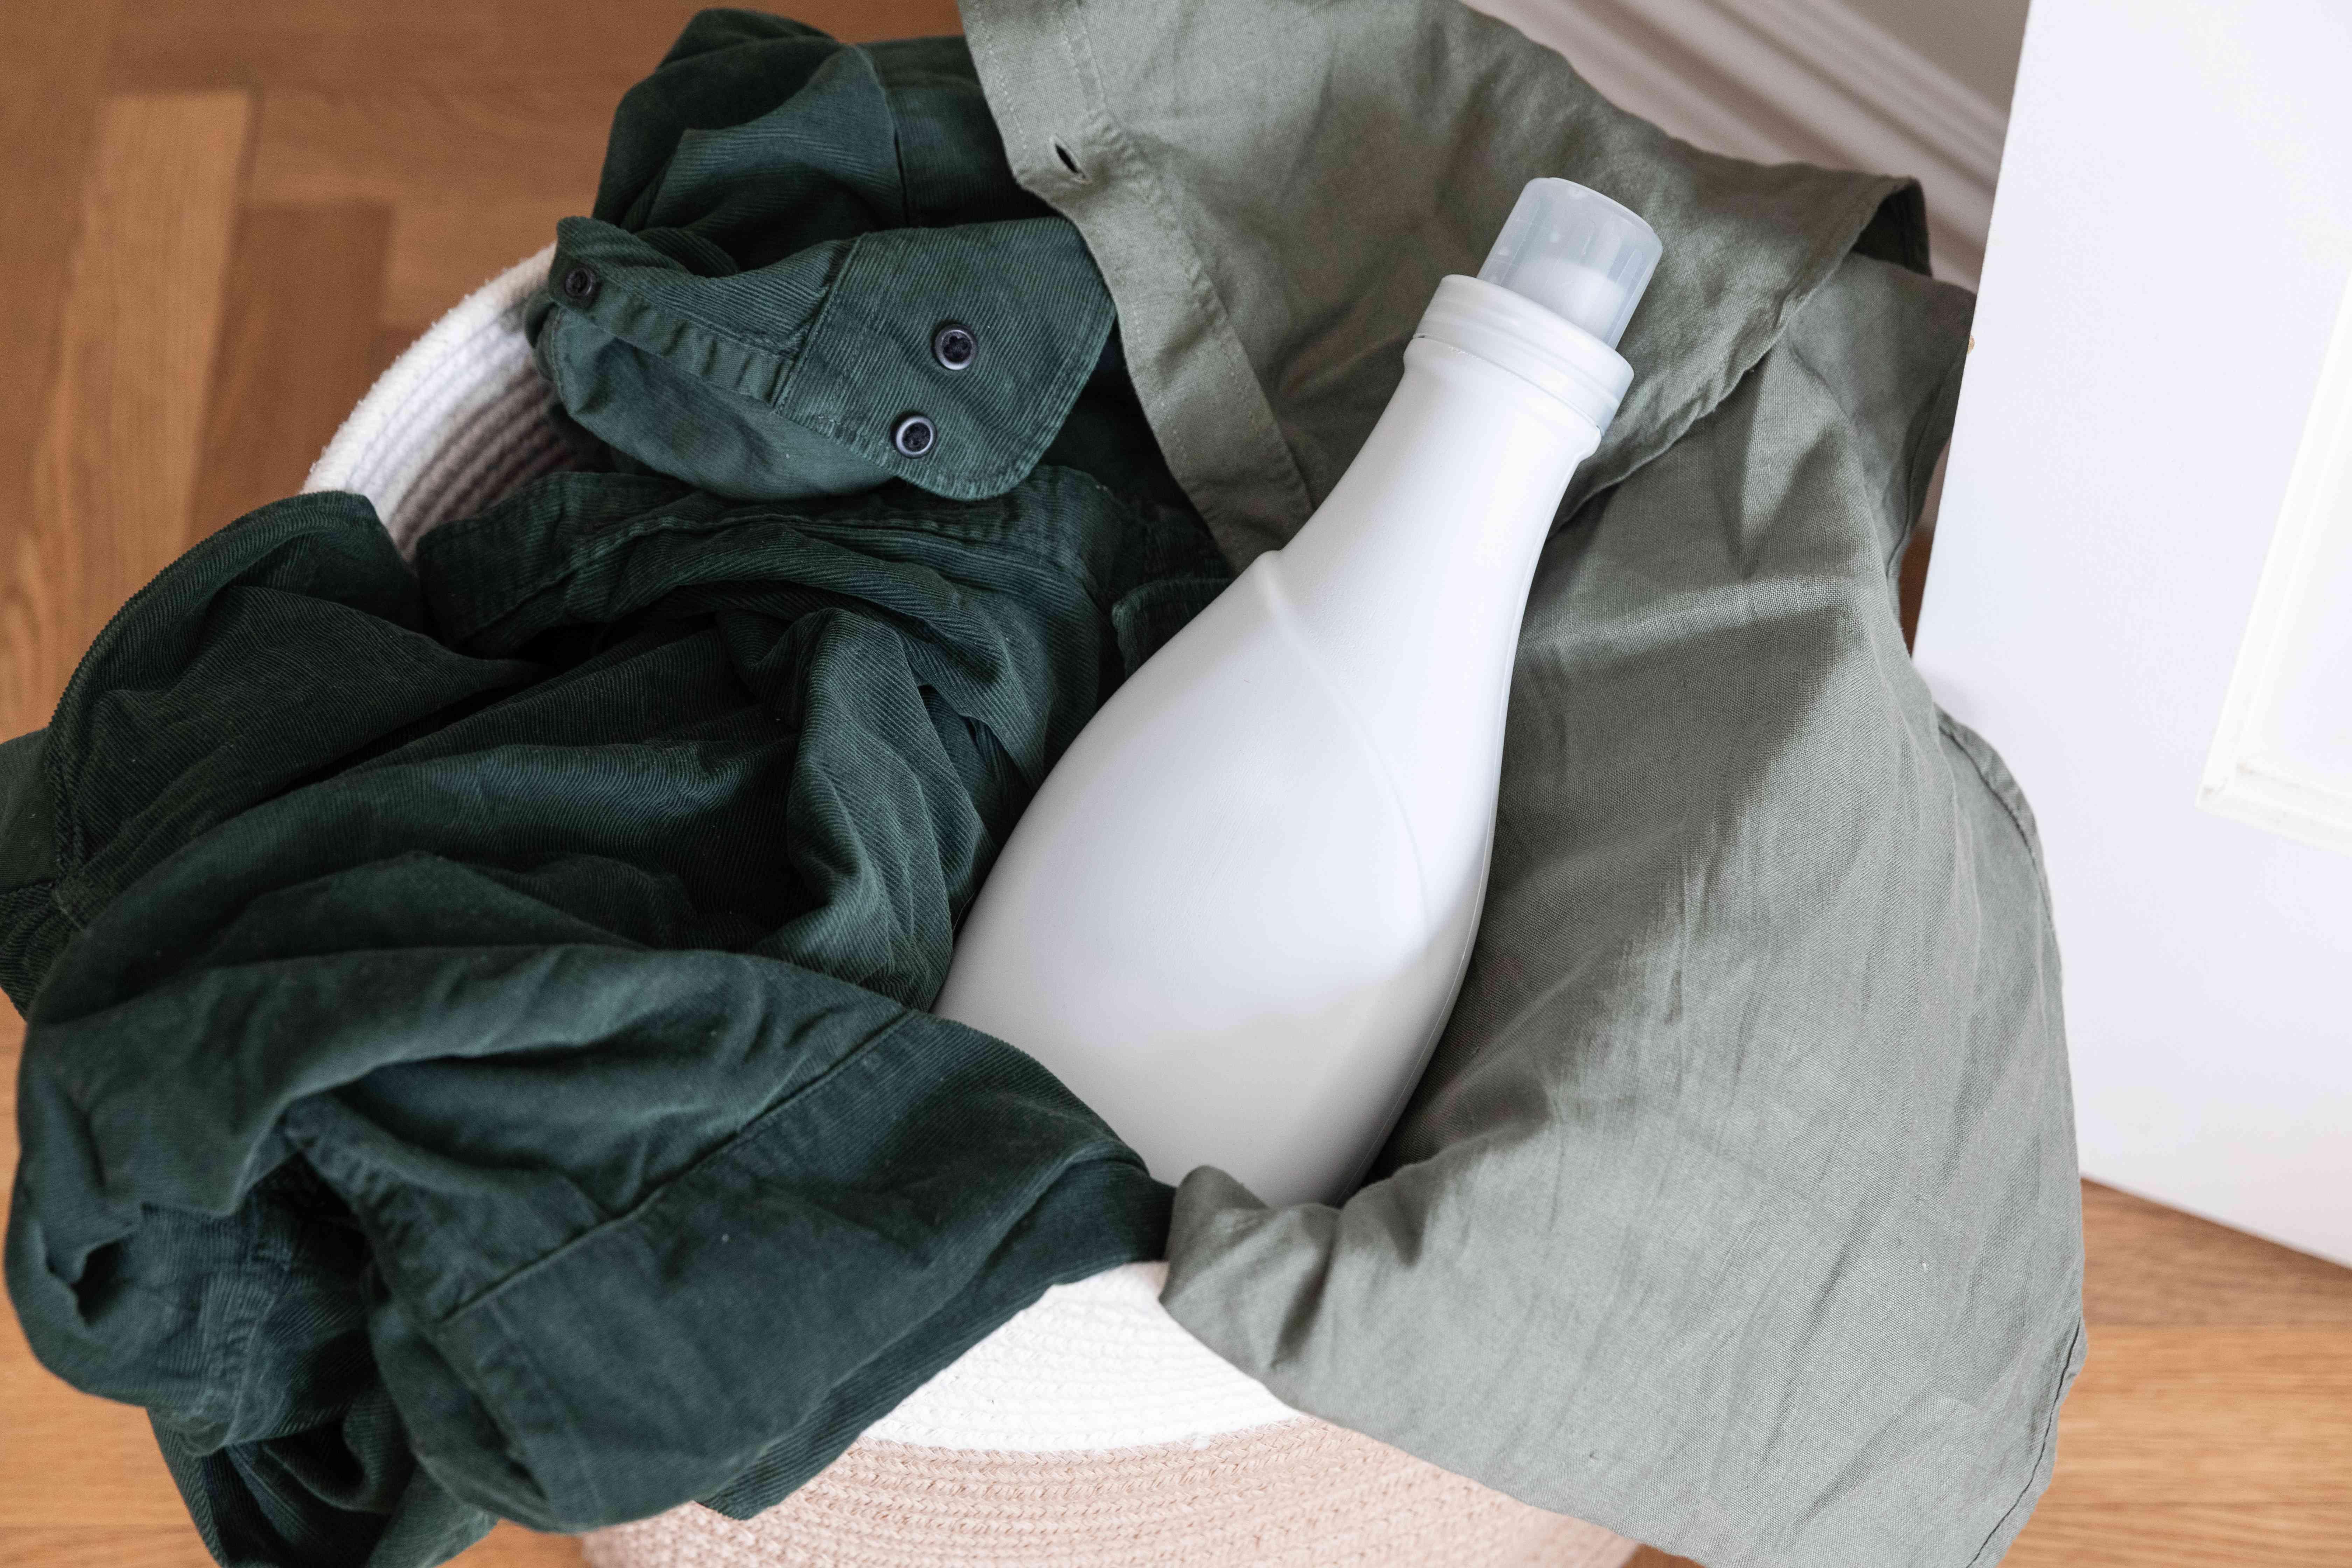 color safe detergent for laundry